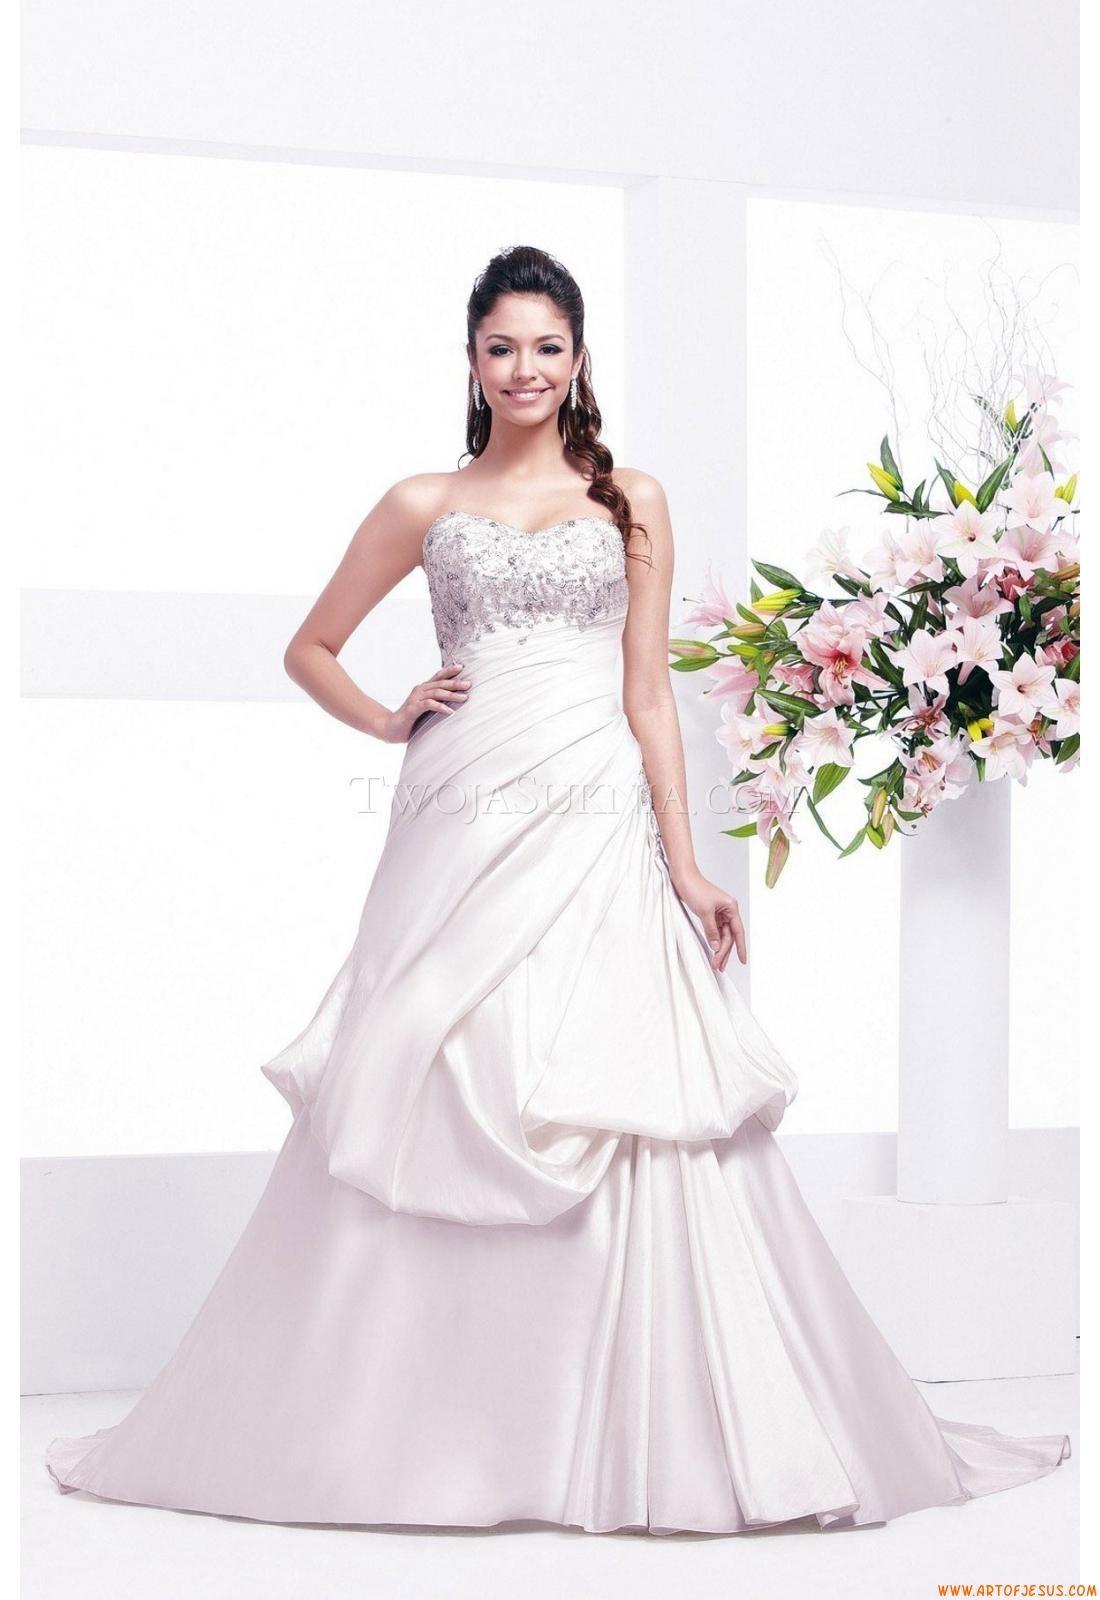 Wedding Dress Veromia VR 61110 Veromia